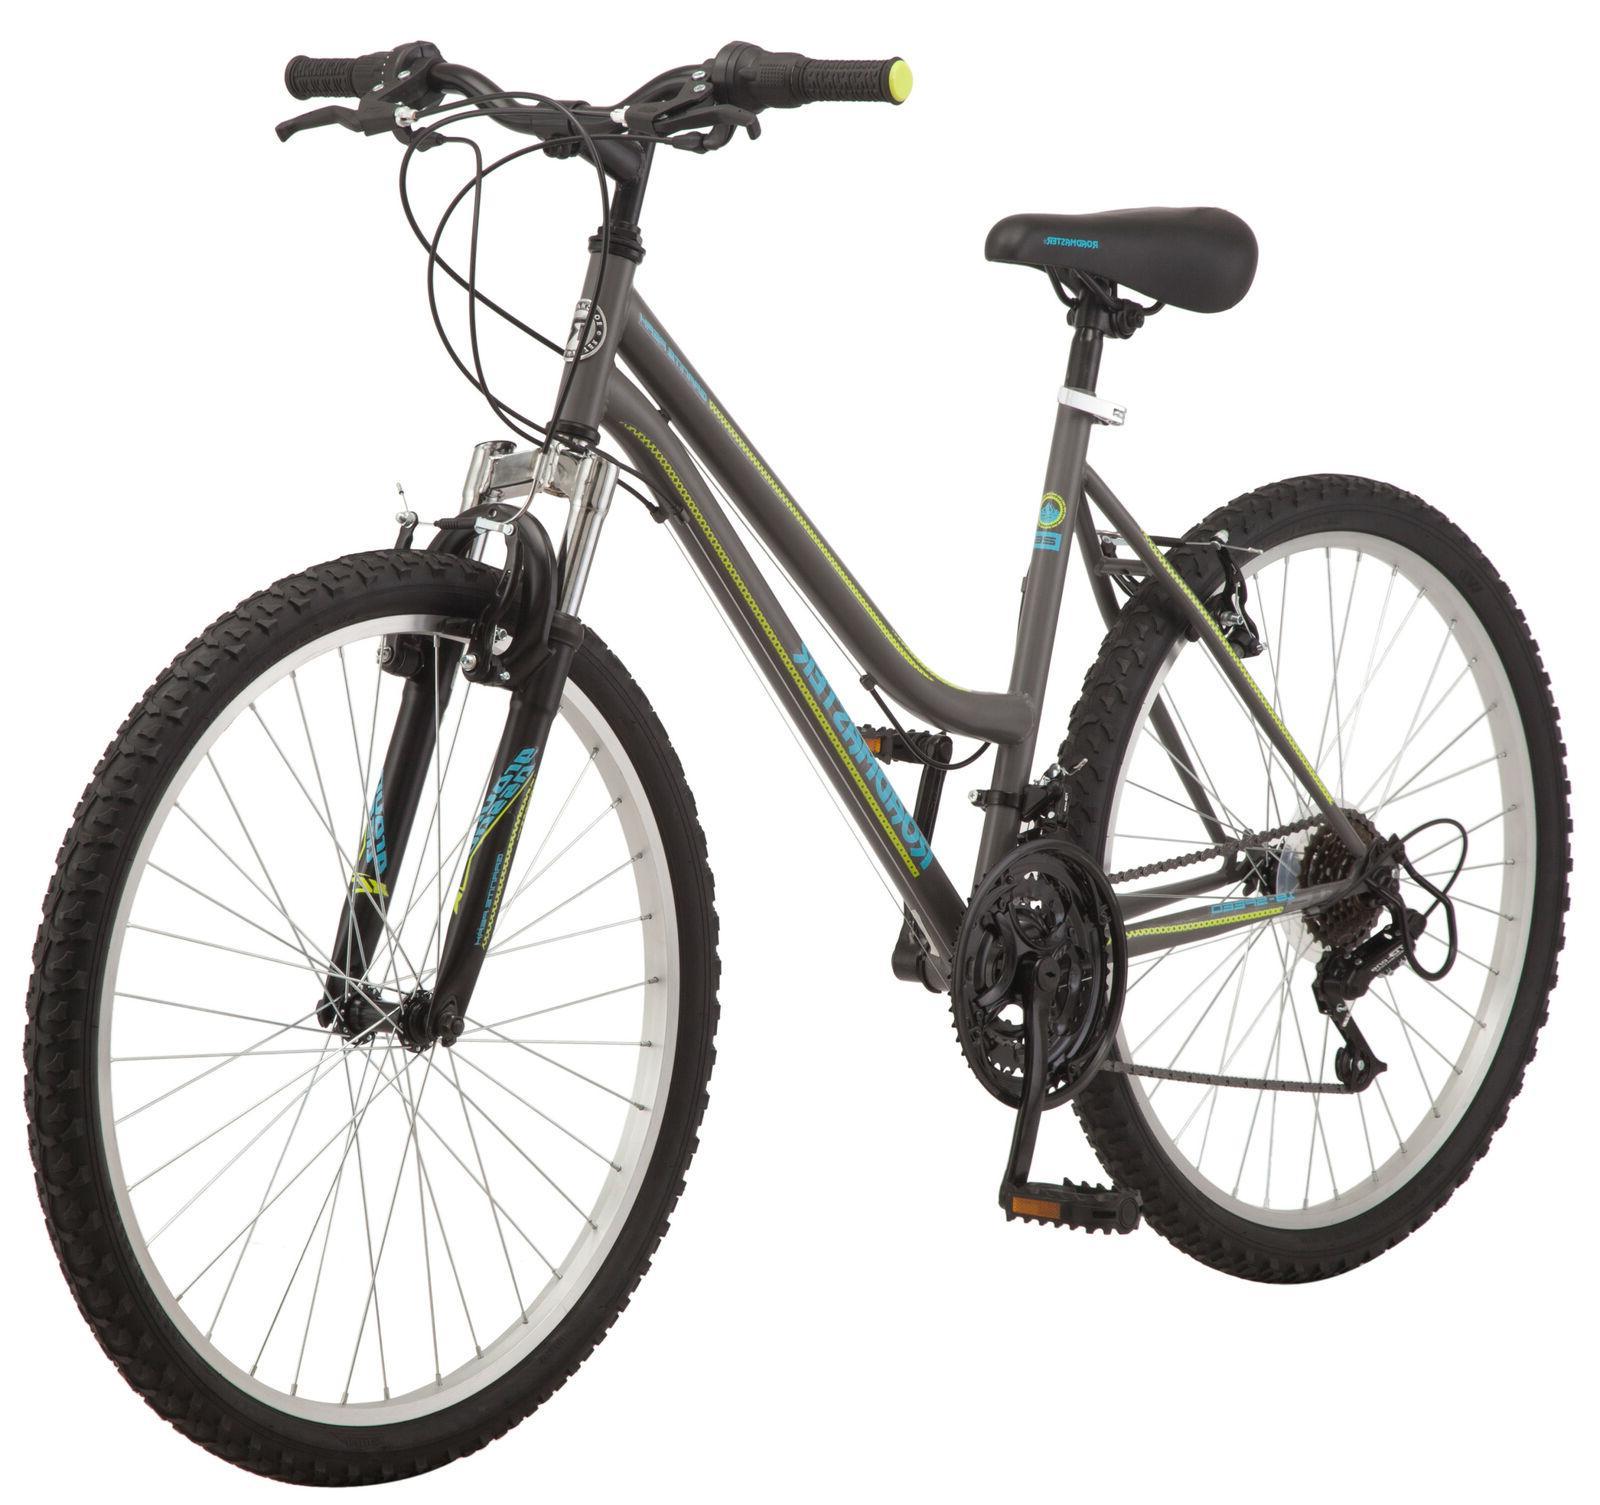 "Women's Mountain Bike 26"" Inches Roadmaster Granite Peak Bic"